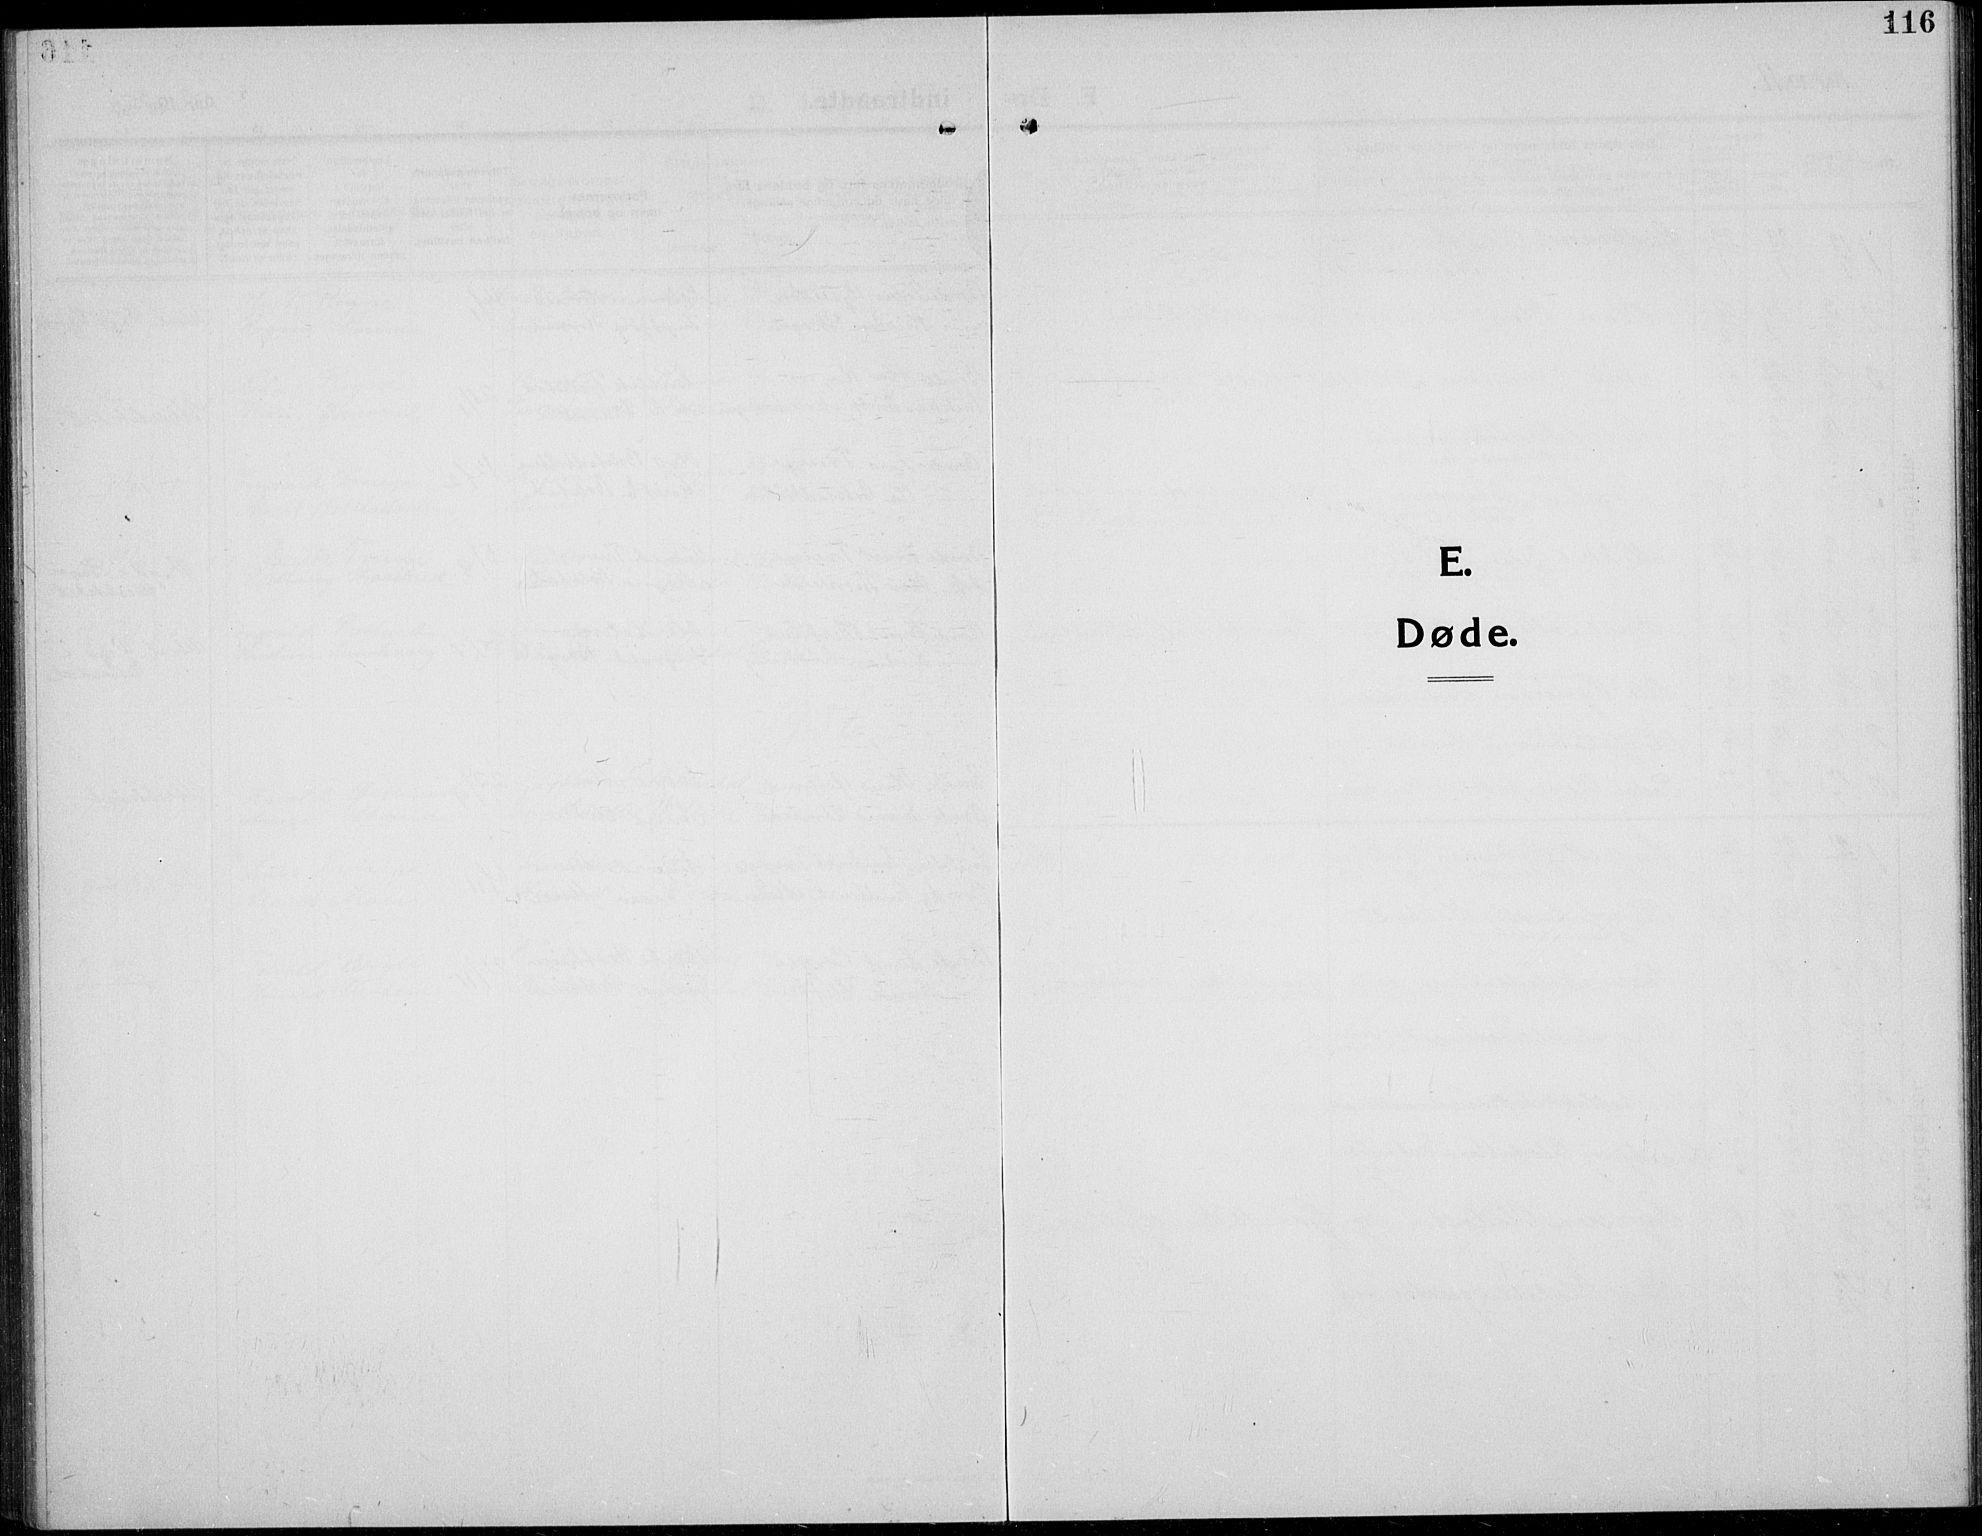 SAH, Øystre Slidre prestekontor, Klokkerbok nr. 8, 1911-1938, s. 116